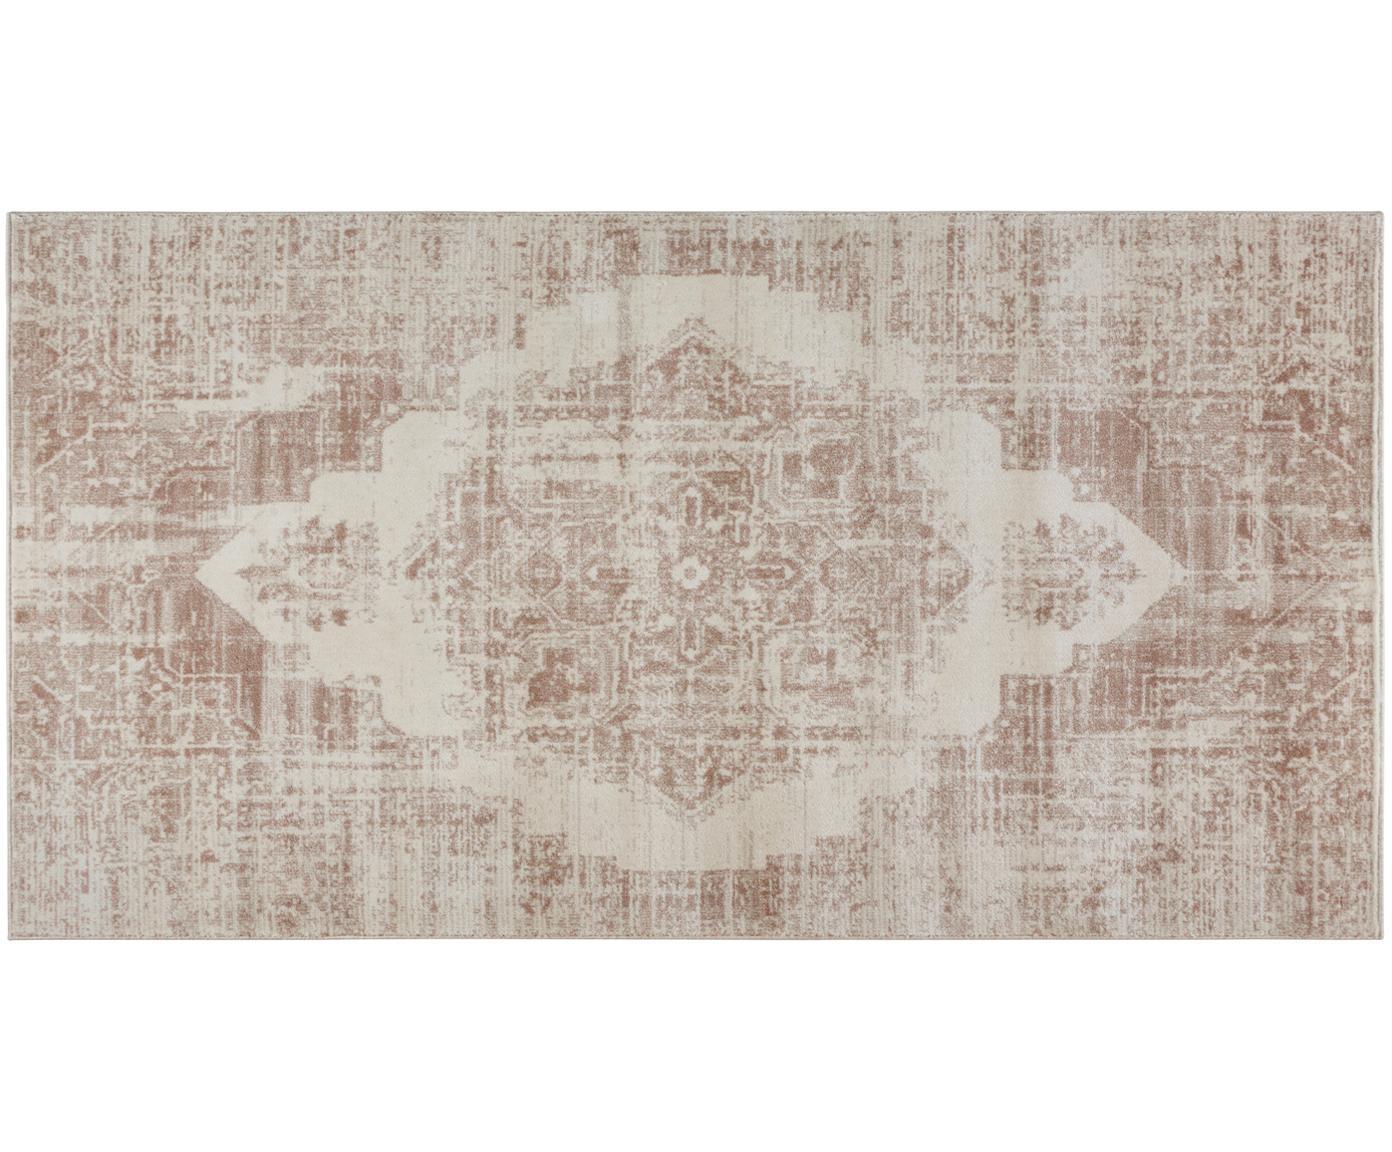 Tappeto vintage  Garonne, Retro: juta, Marrone rame, beige, Larg. 80 x Lung. 150 cm (taglia XS)